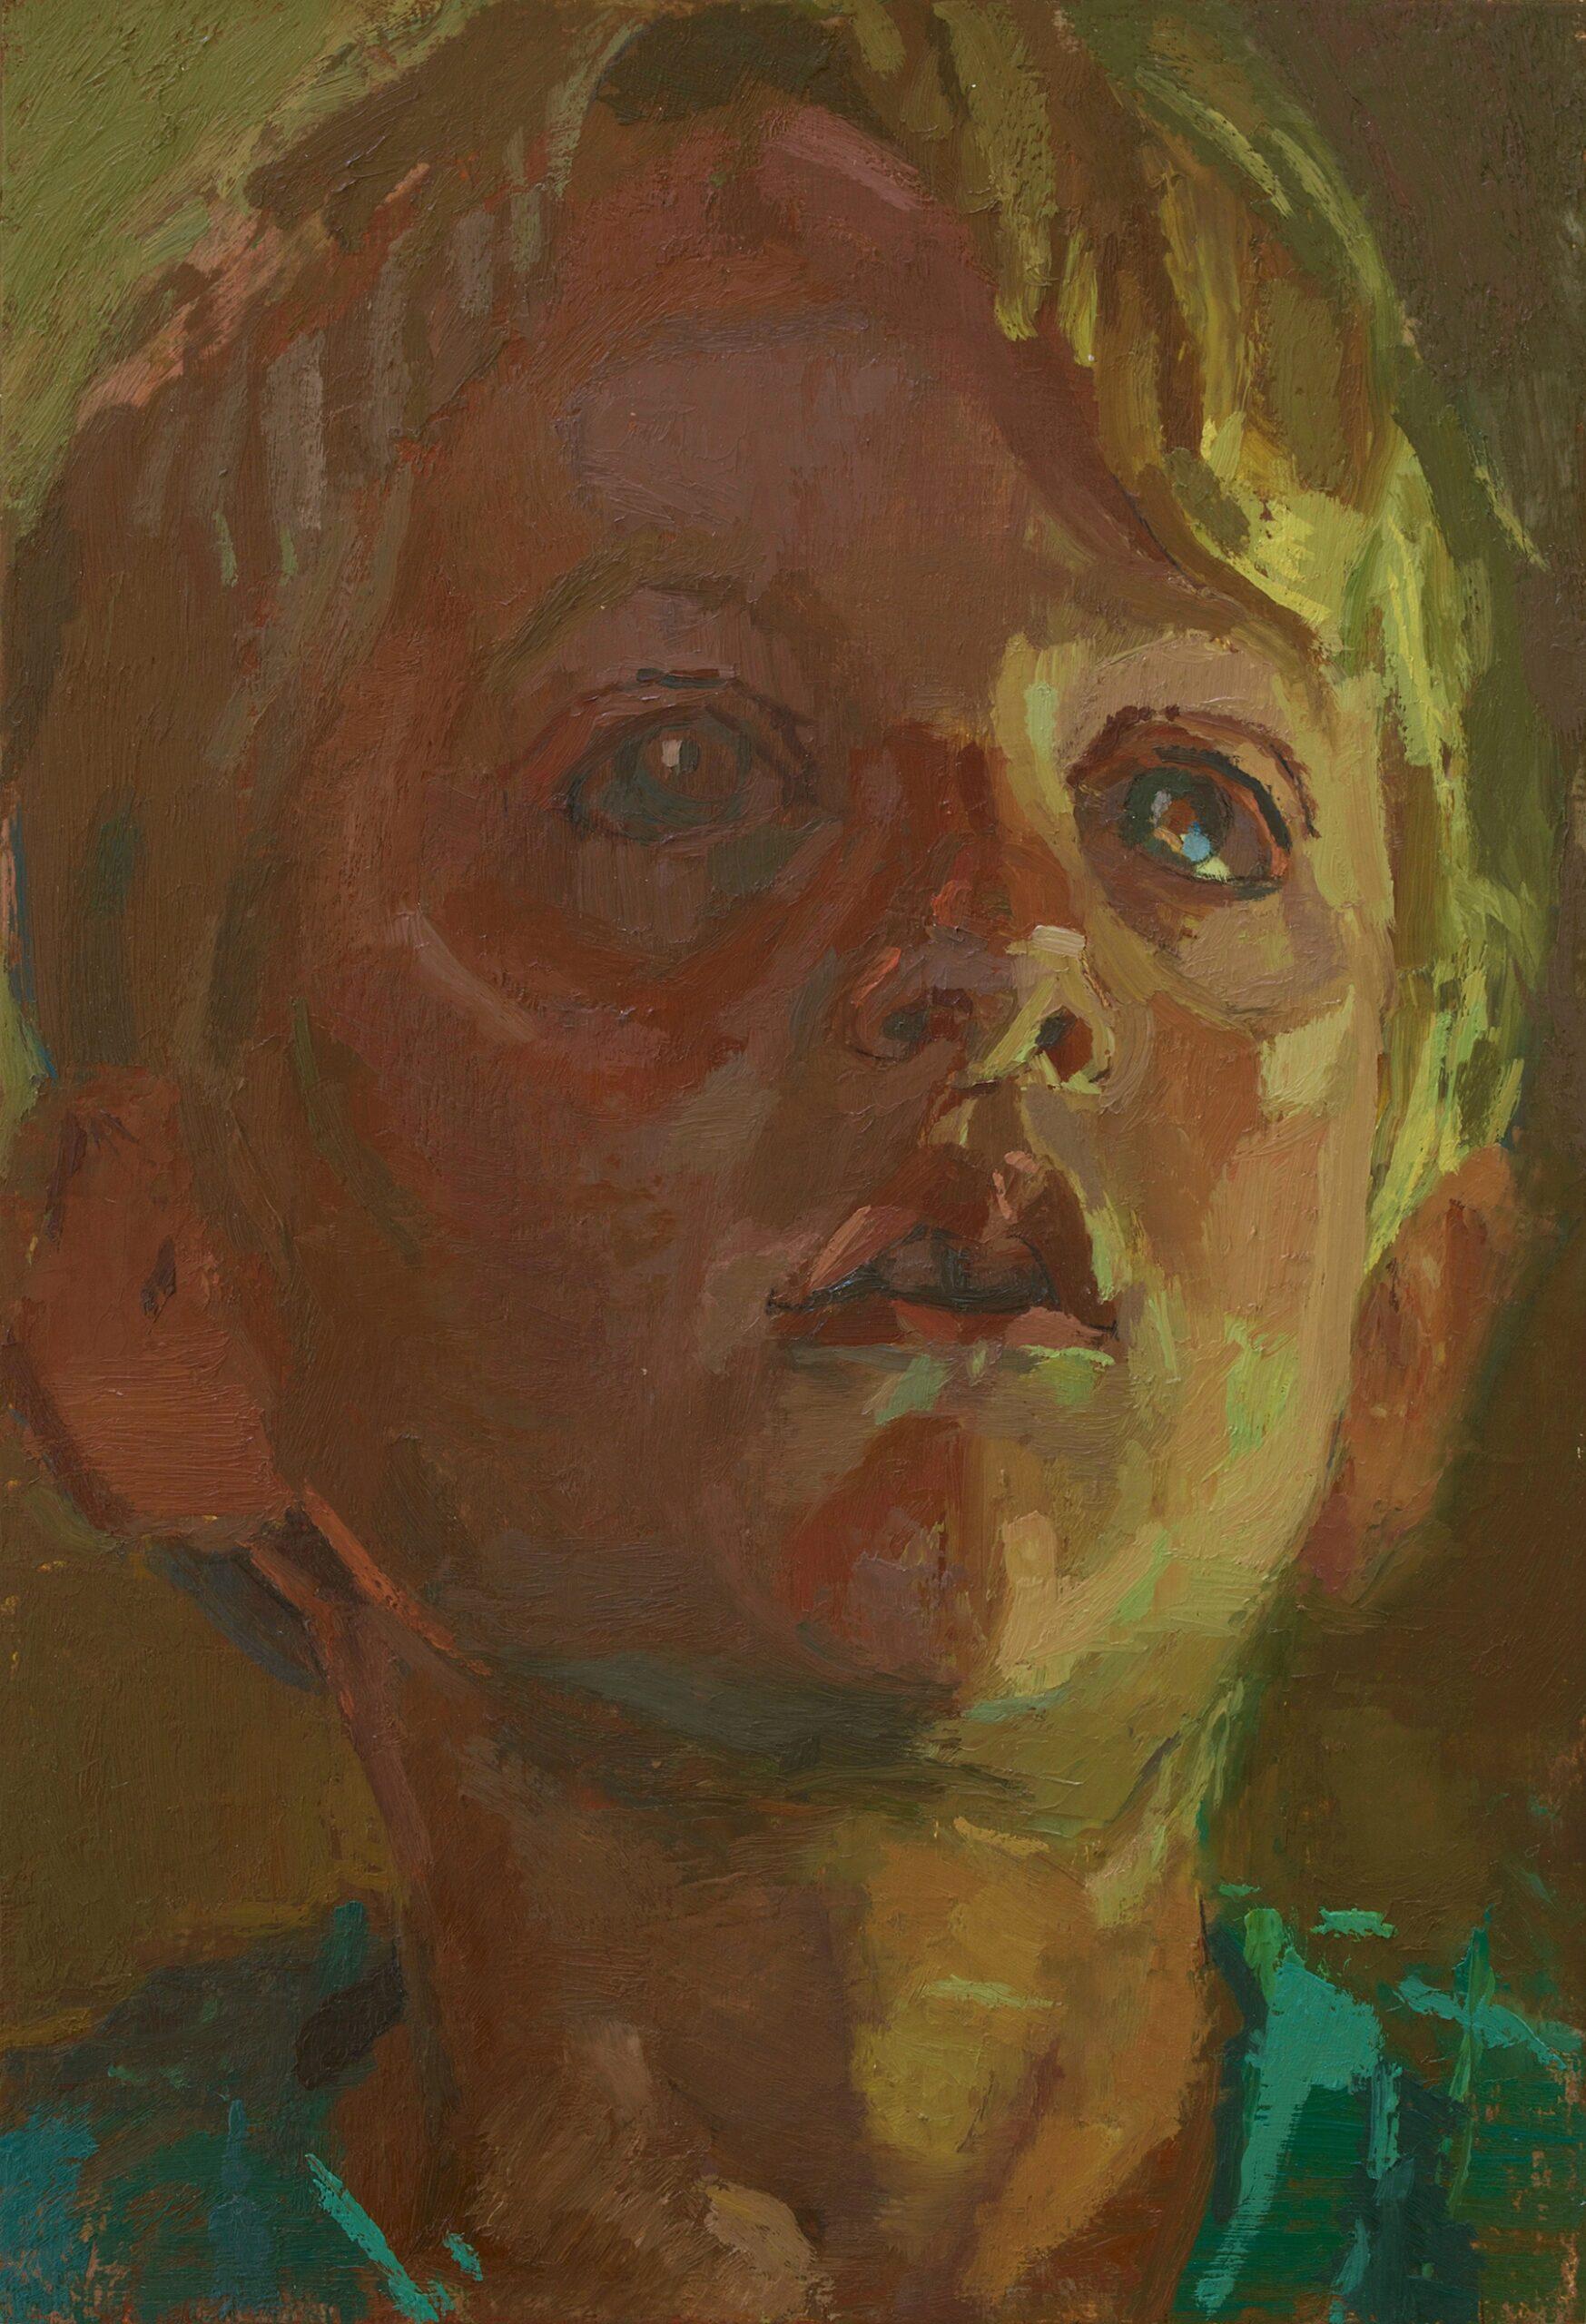 Finn #4. Neil Callander. Jackson's Painting Prize.